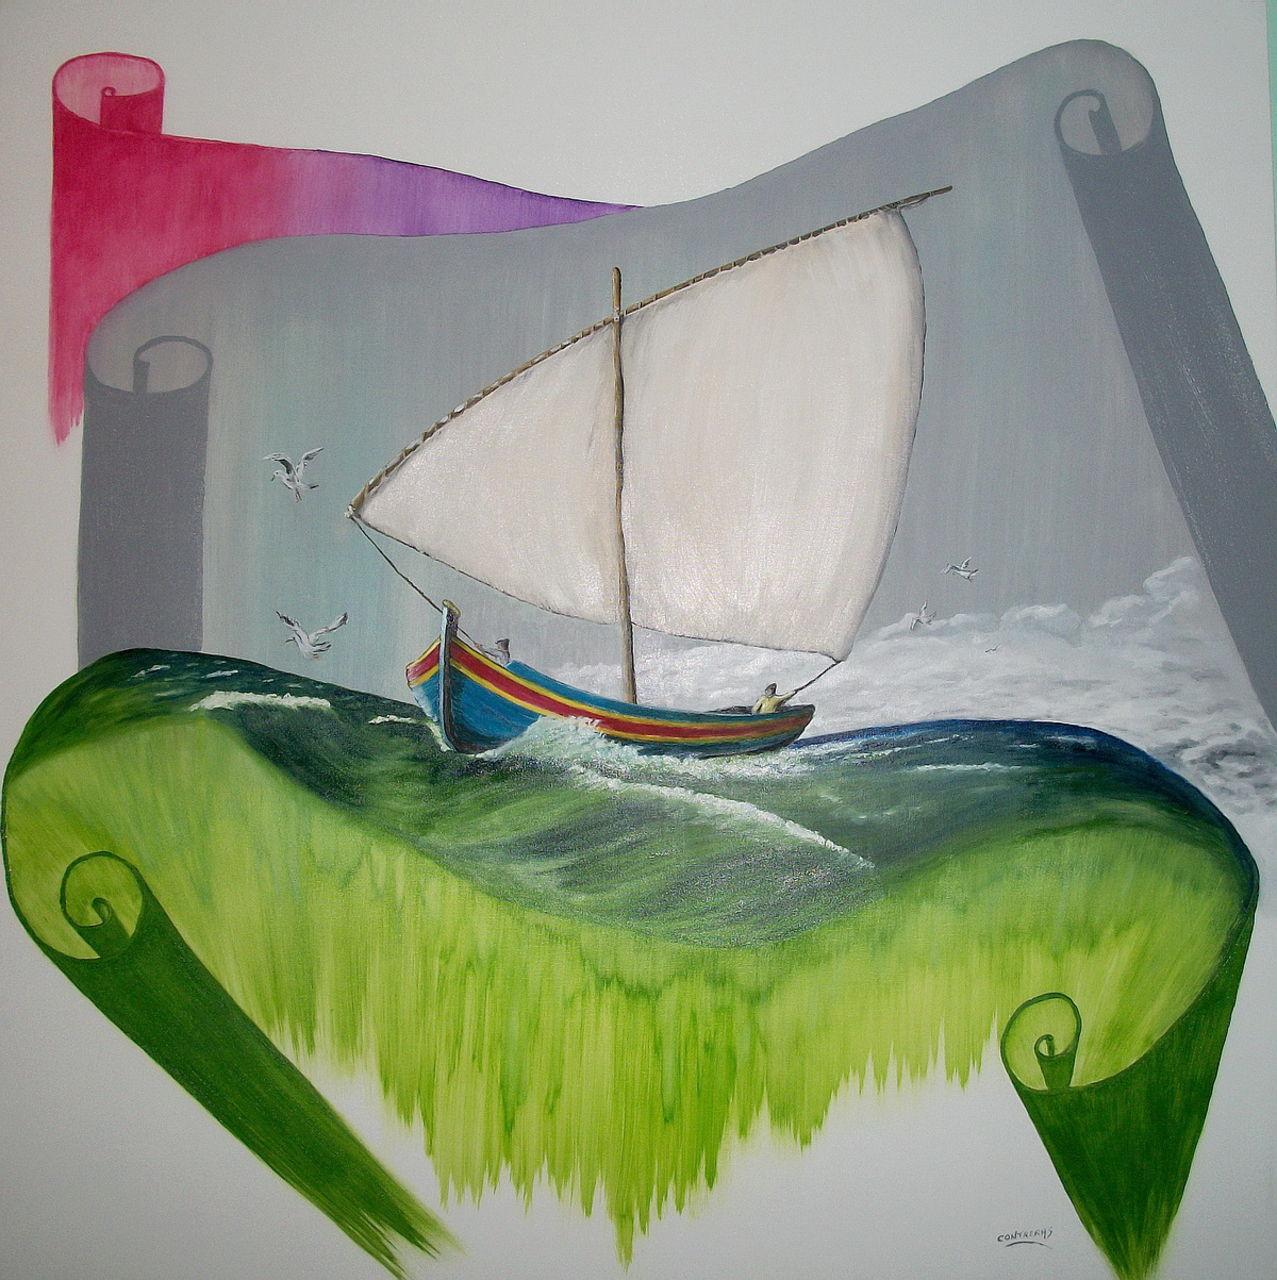 patrick contreras La barque Catalane